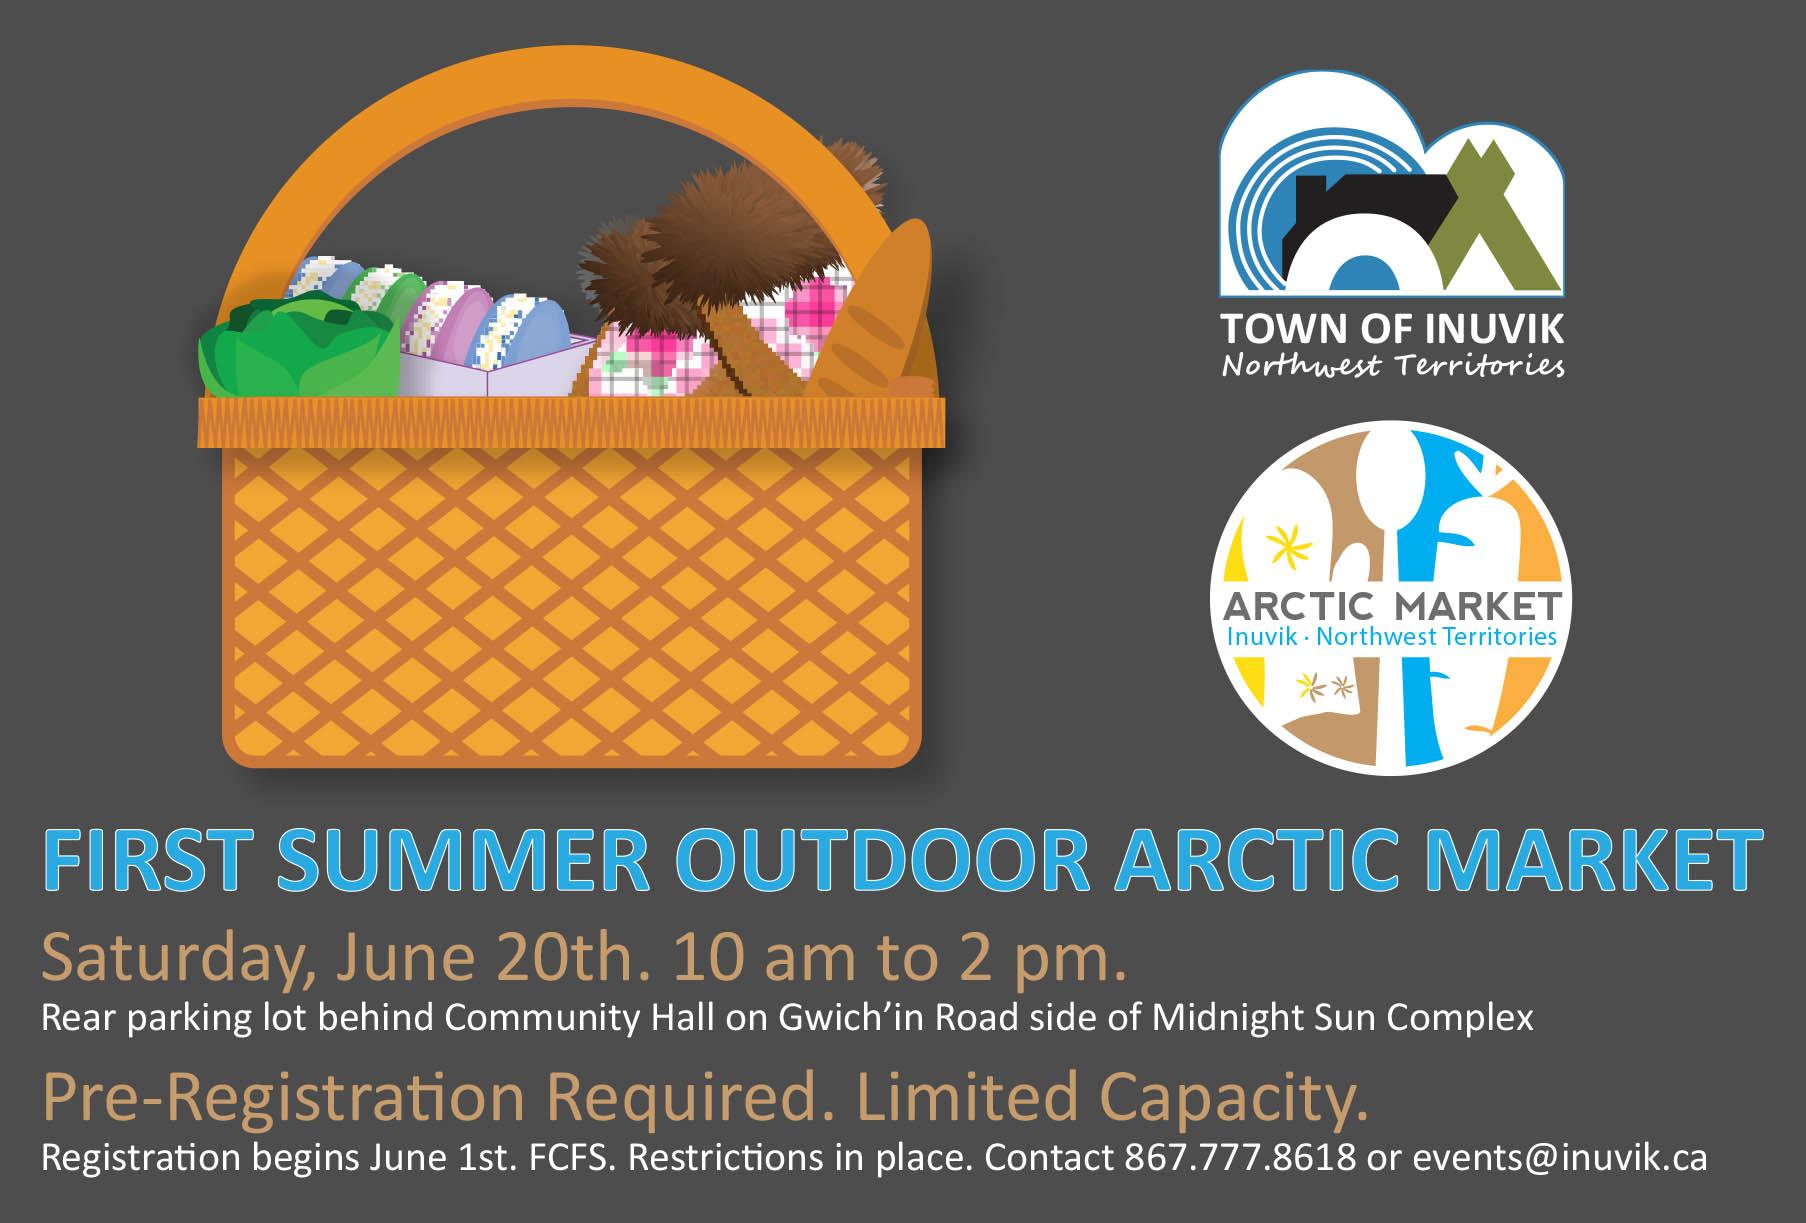 FIRST ARCTIC MARKET - JUNE 20, 2020